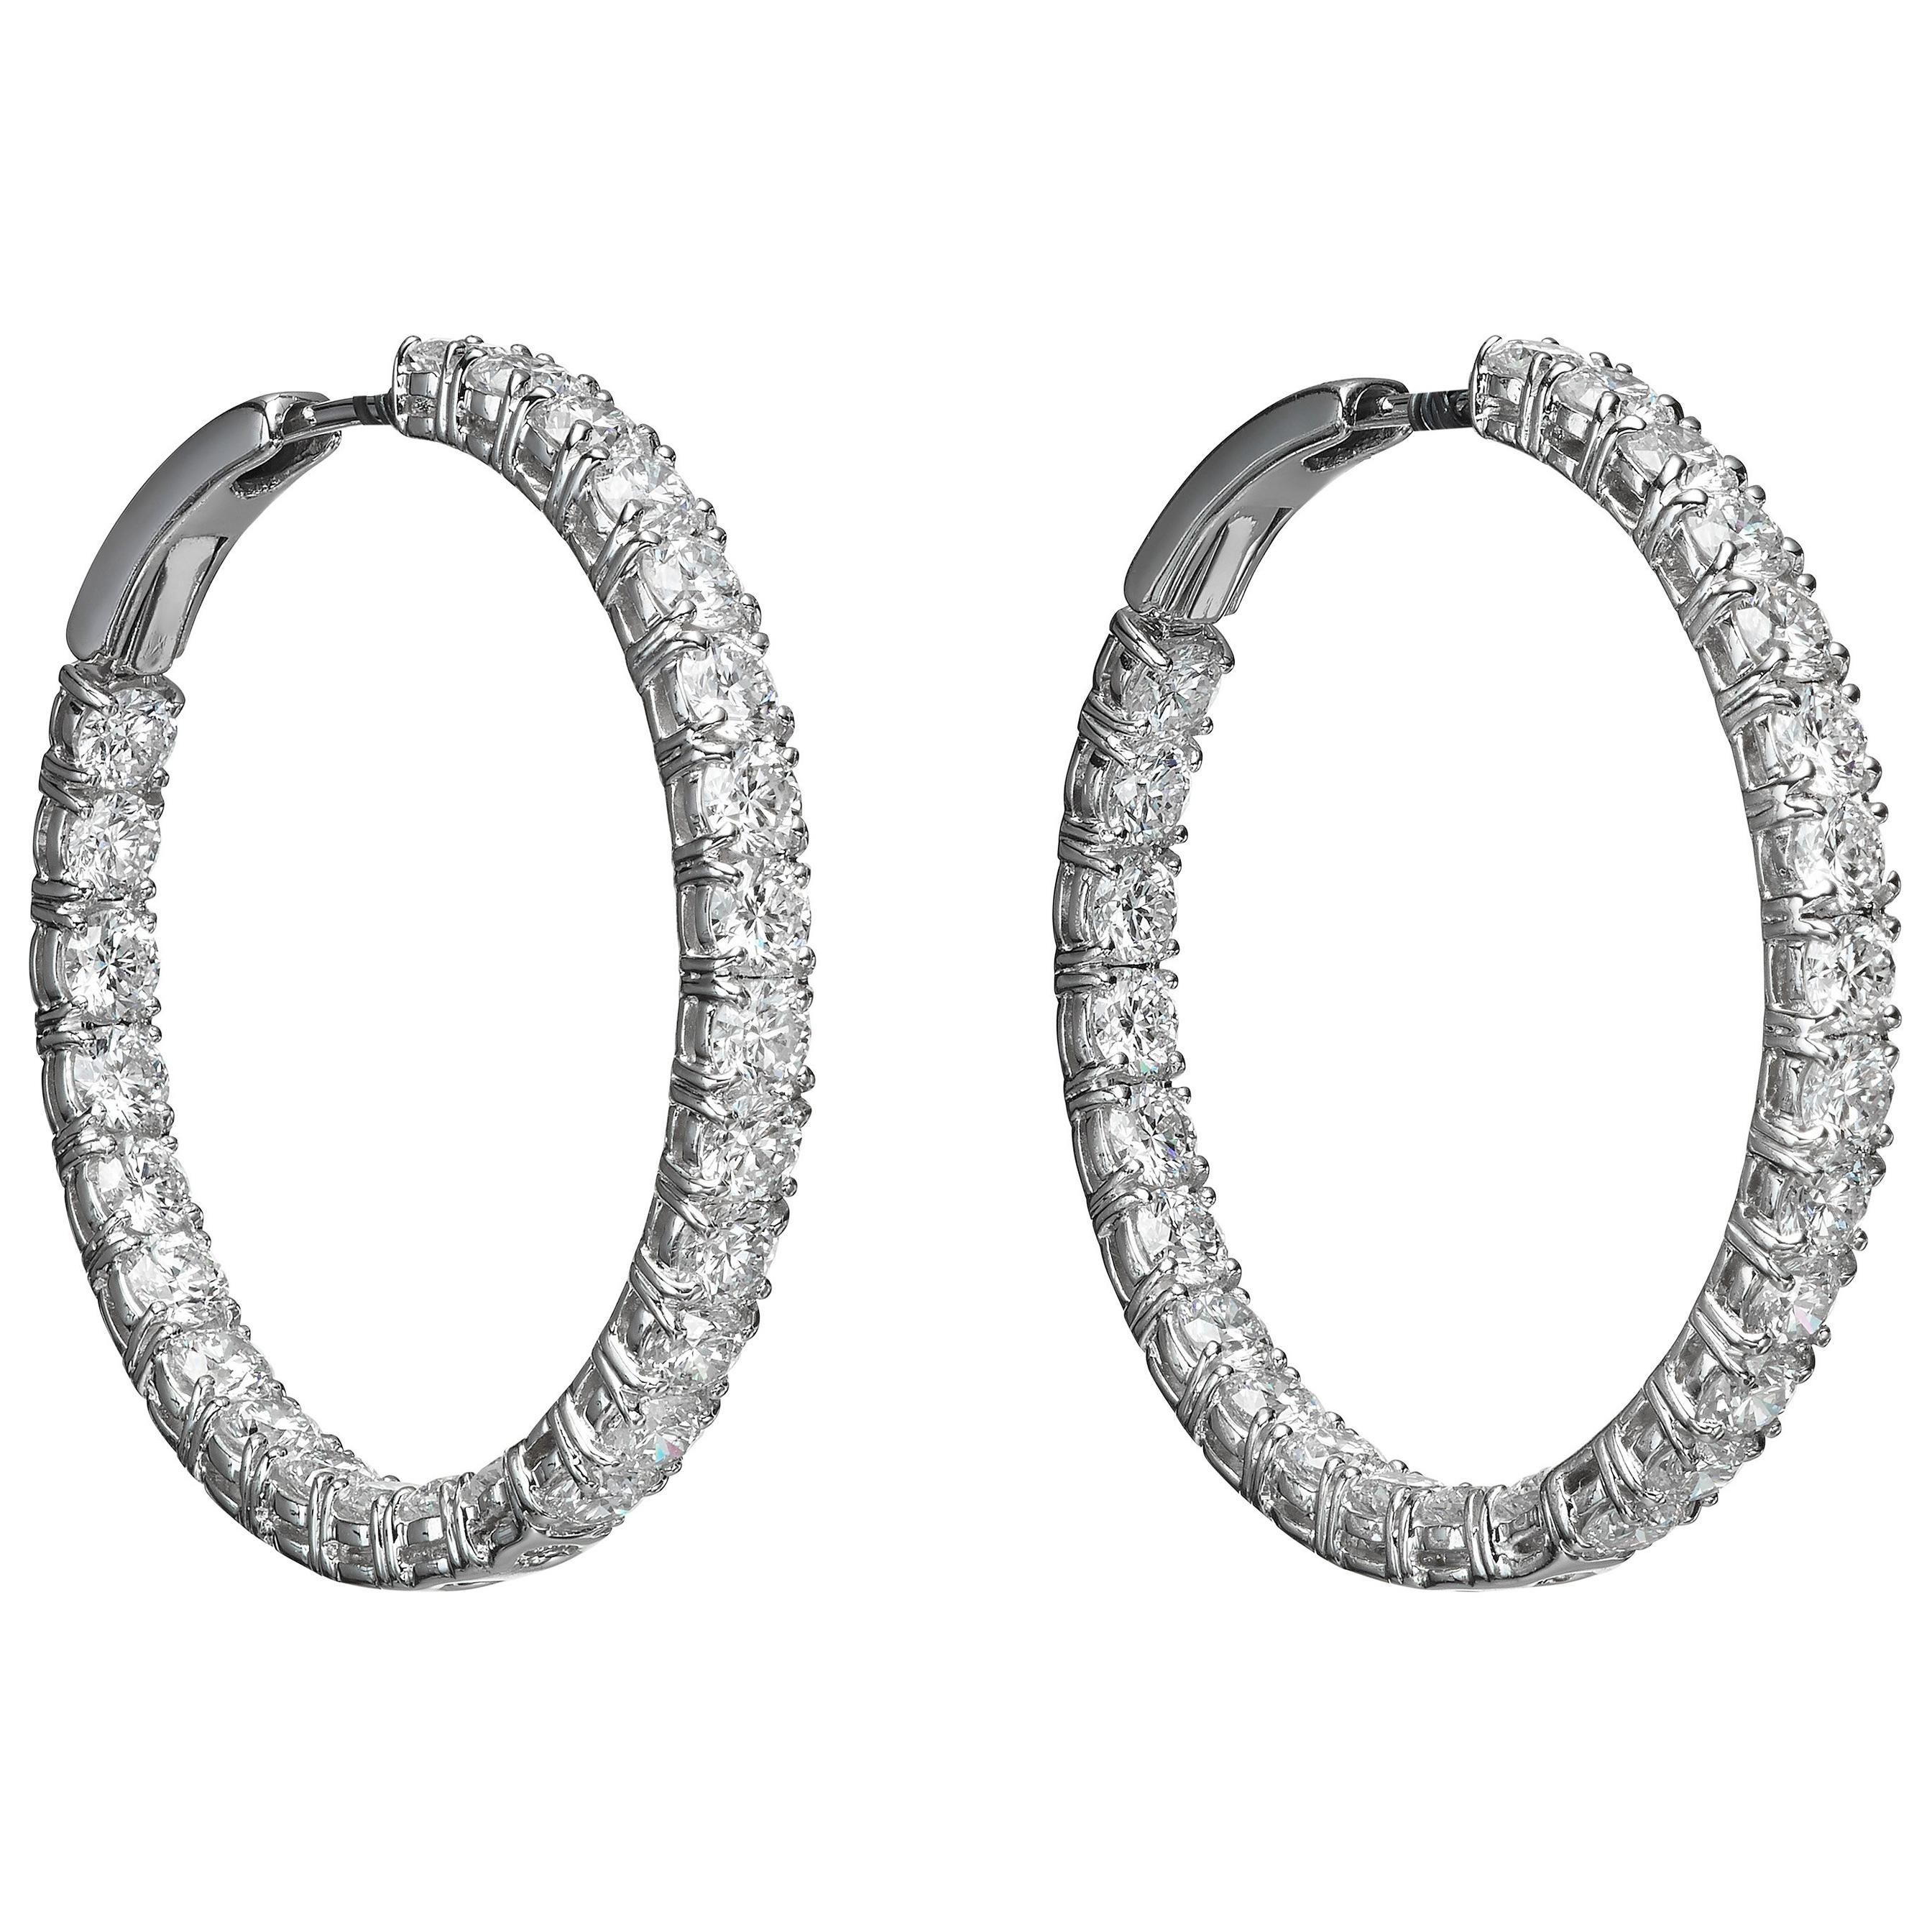 7.24 Carat White Diamond 18 Karat White Gold Hoop Earrings